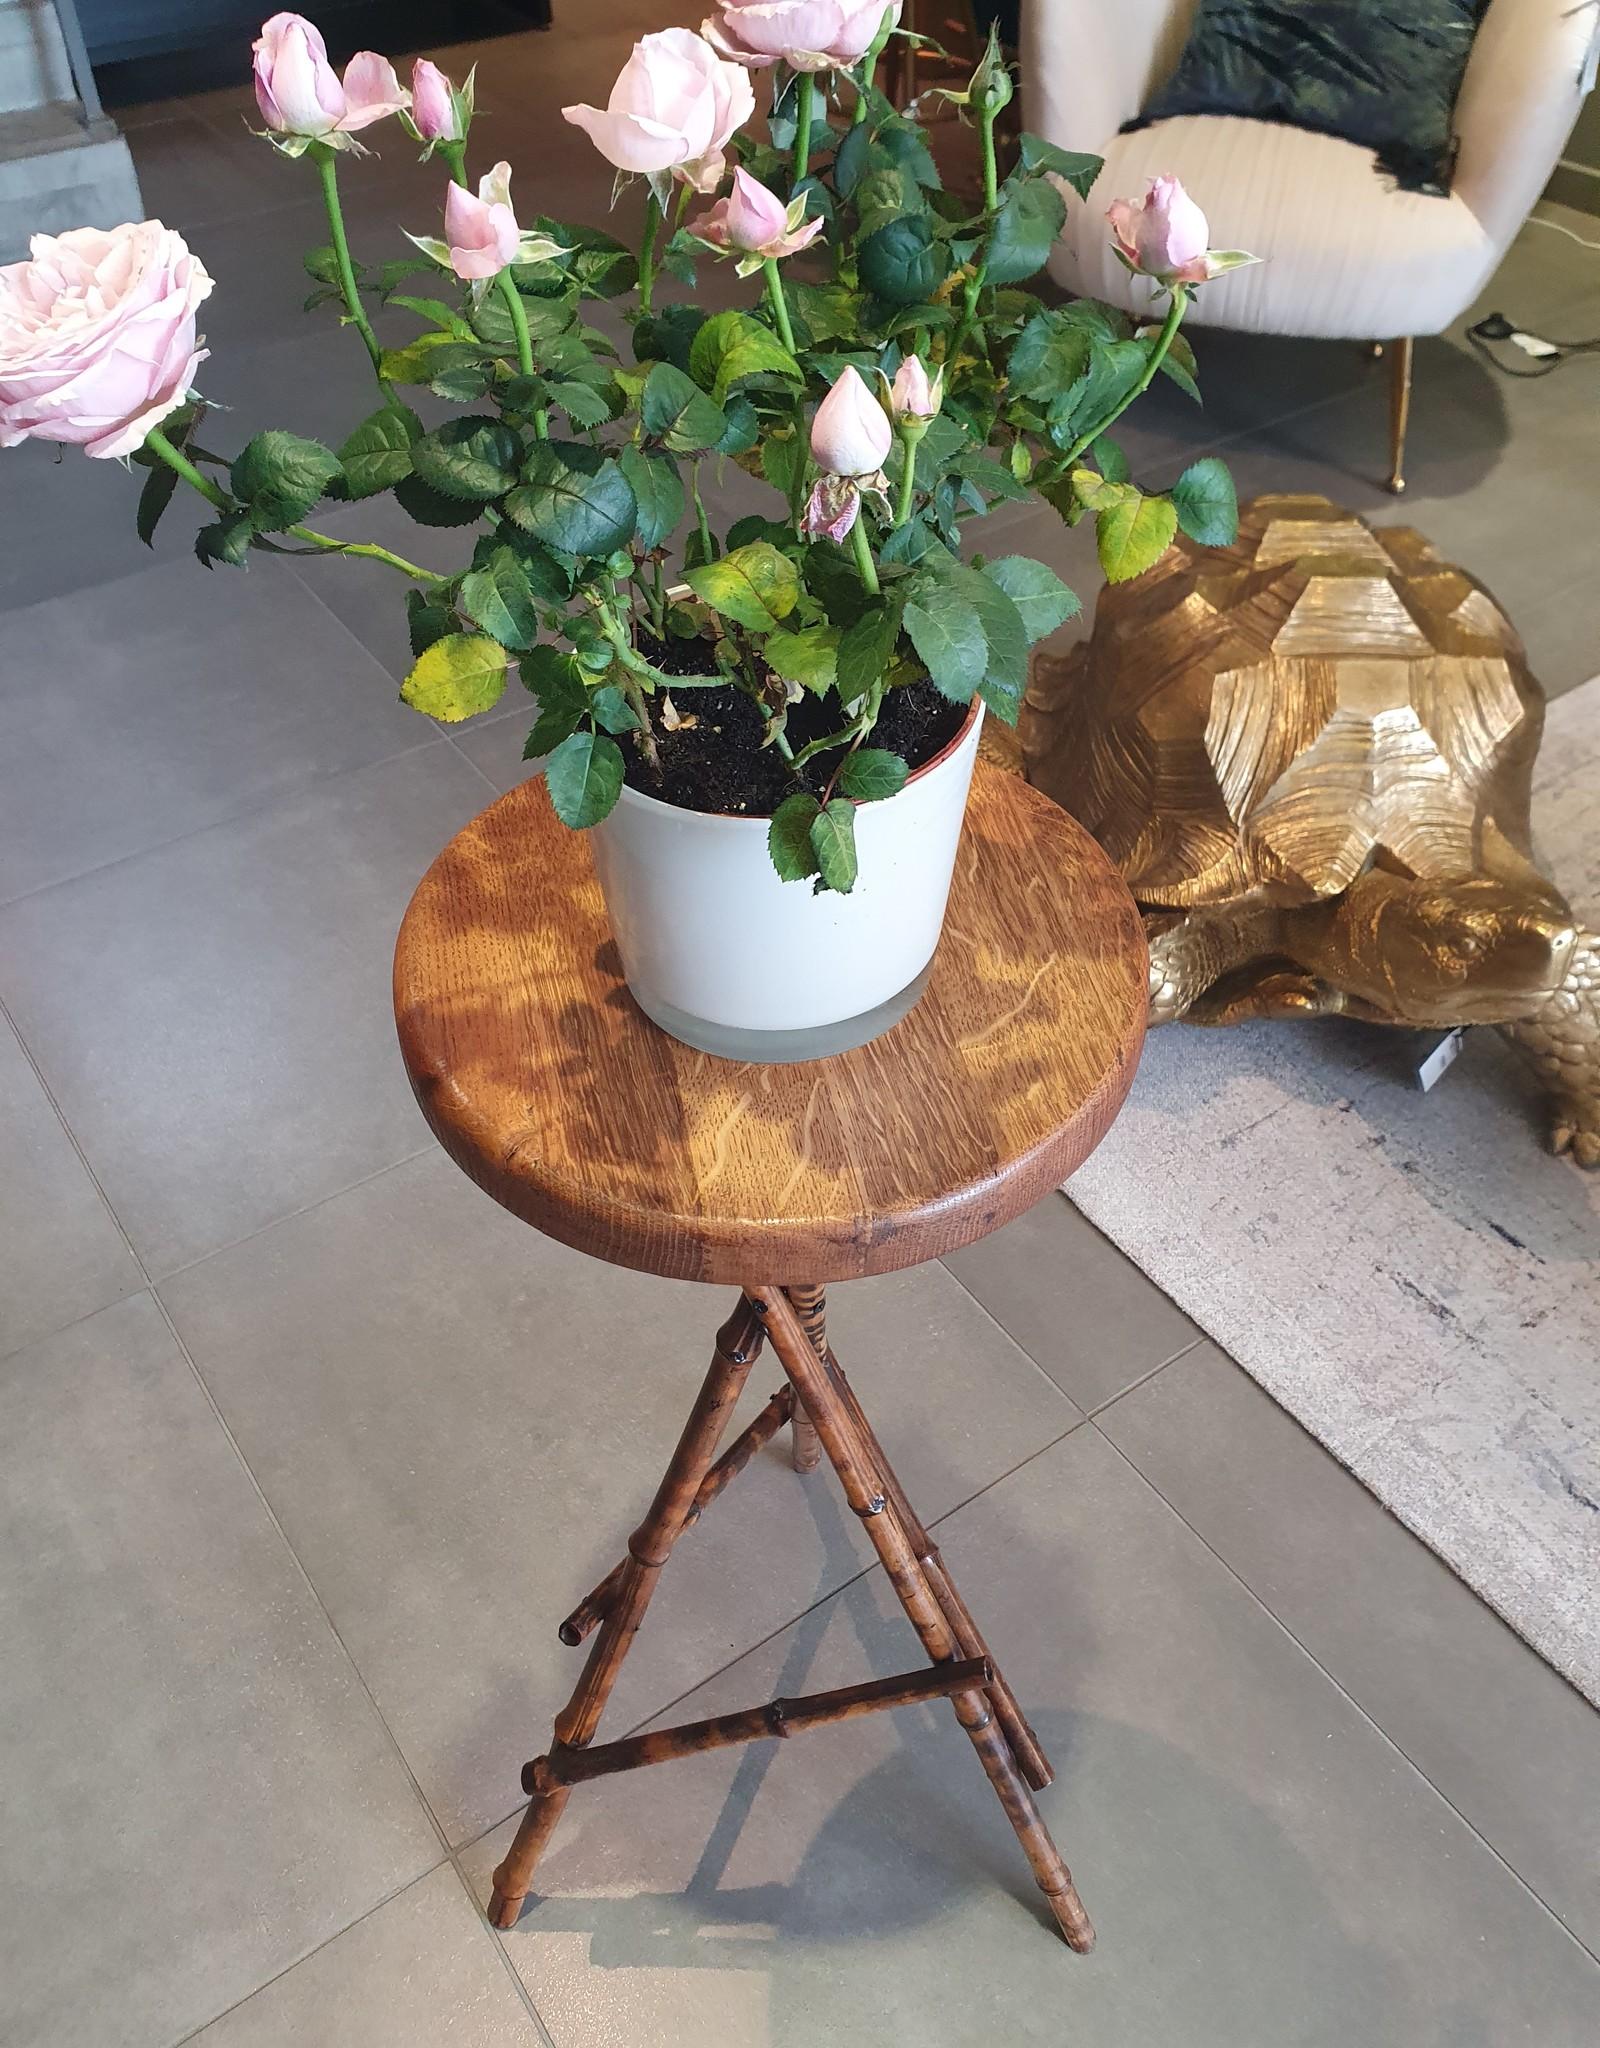 Vintage bloemenkrukje